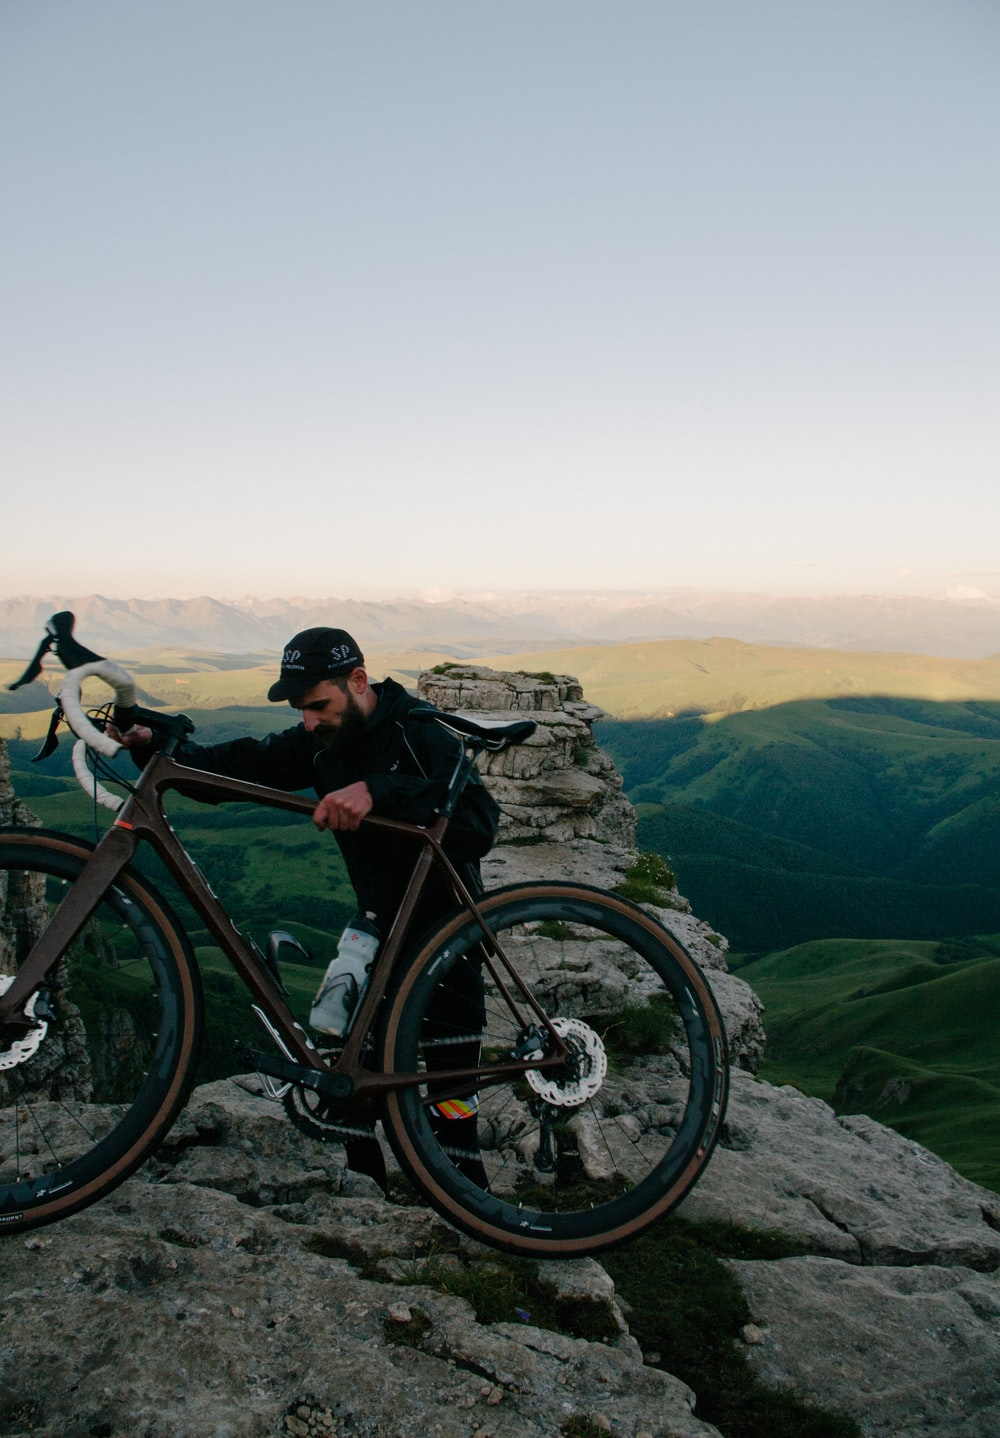 man carrying road bike at top of mountain